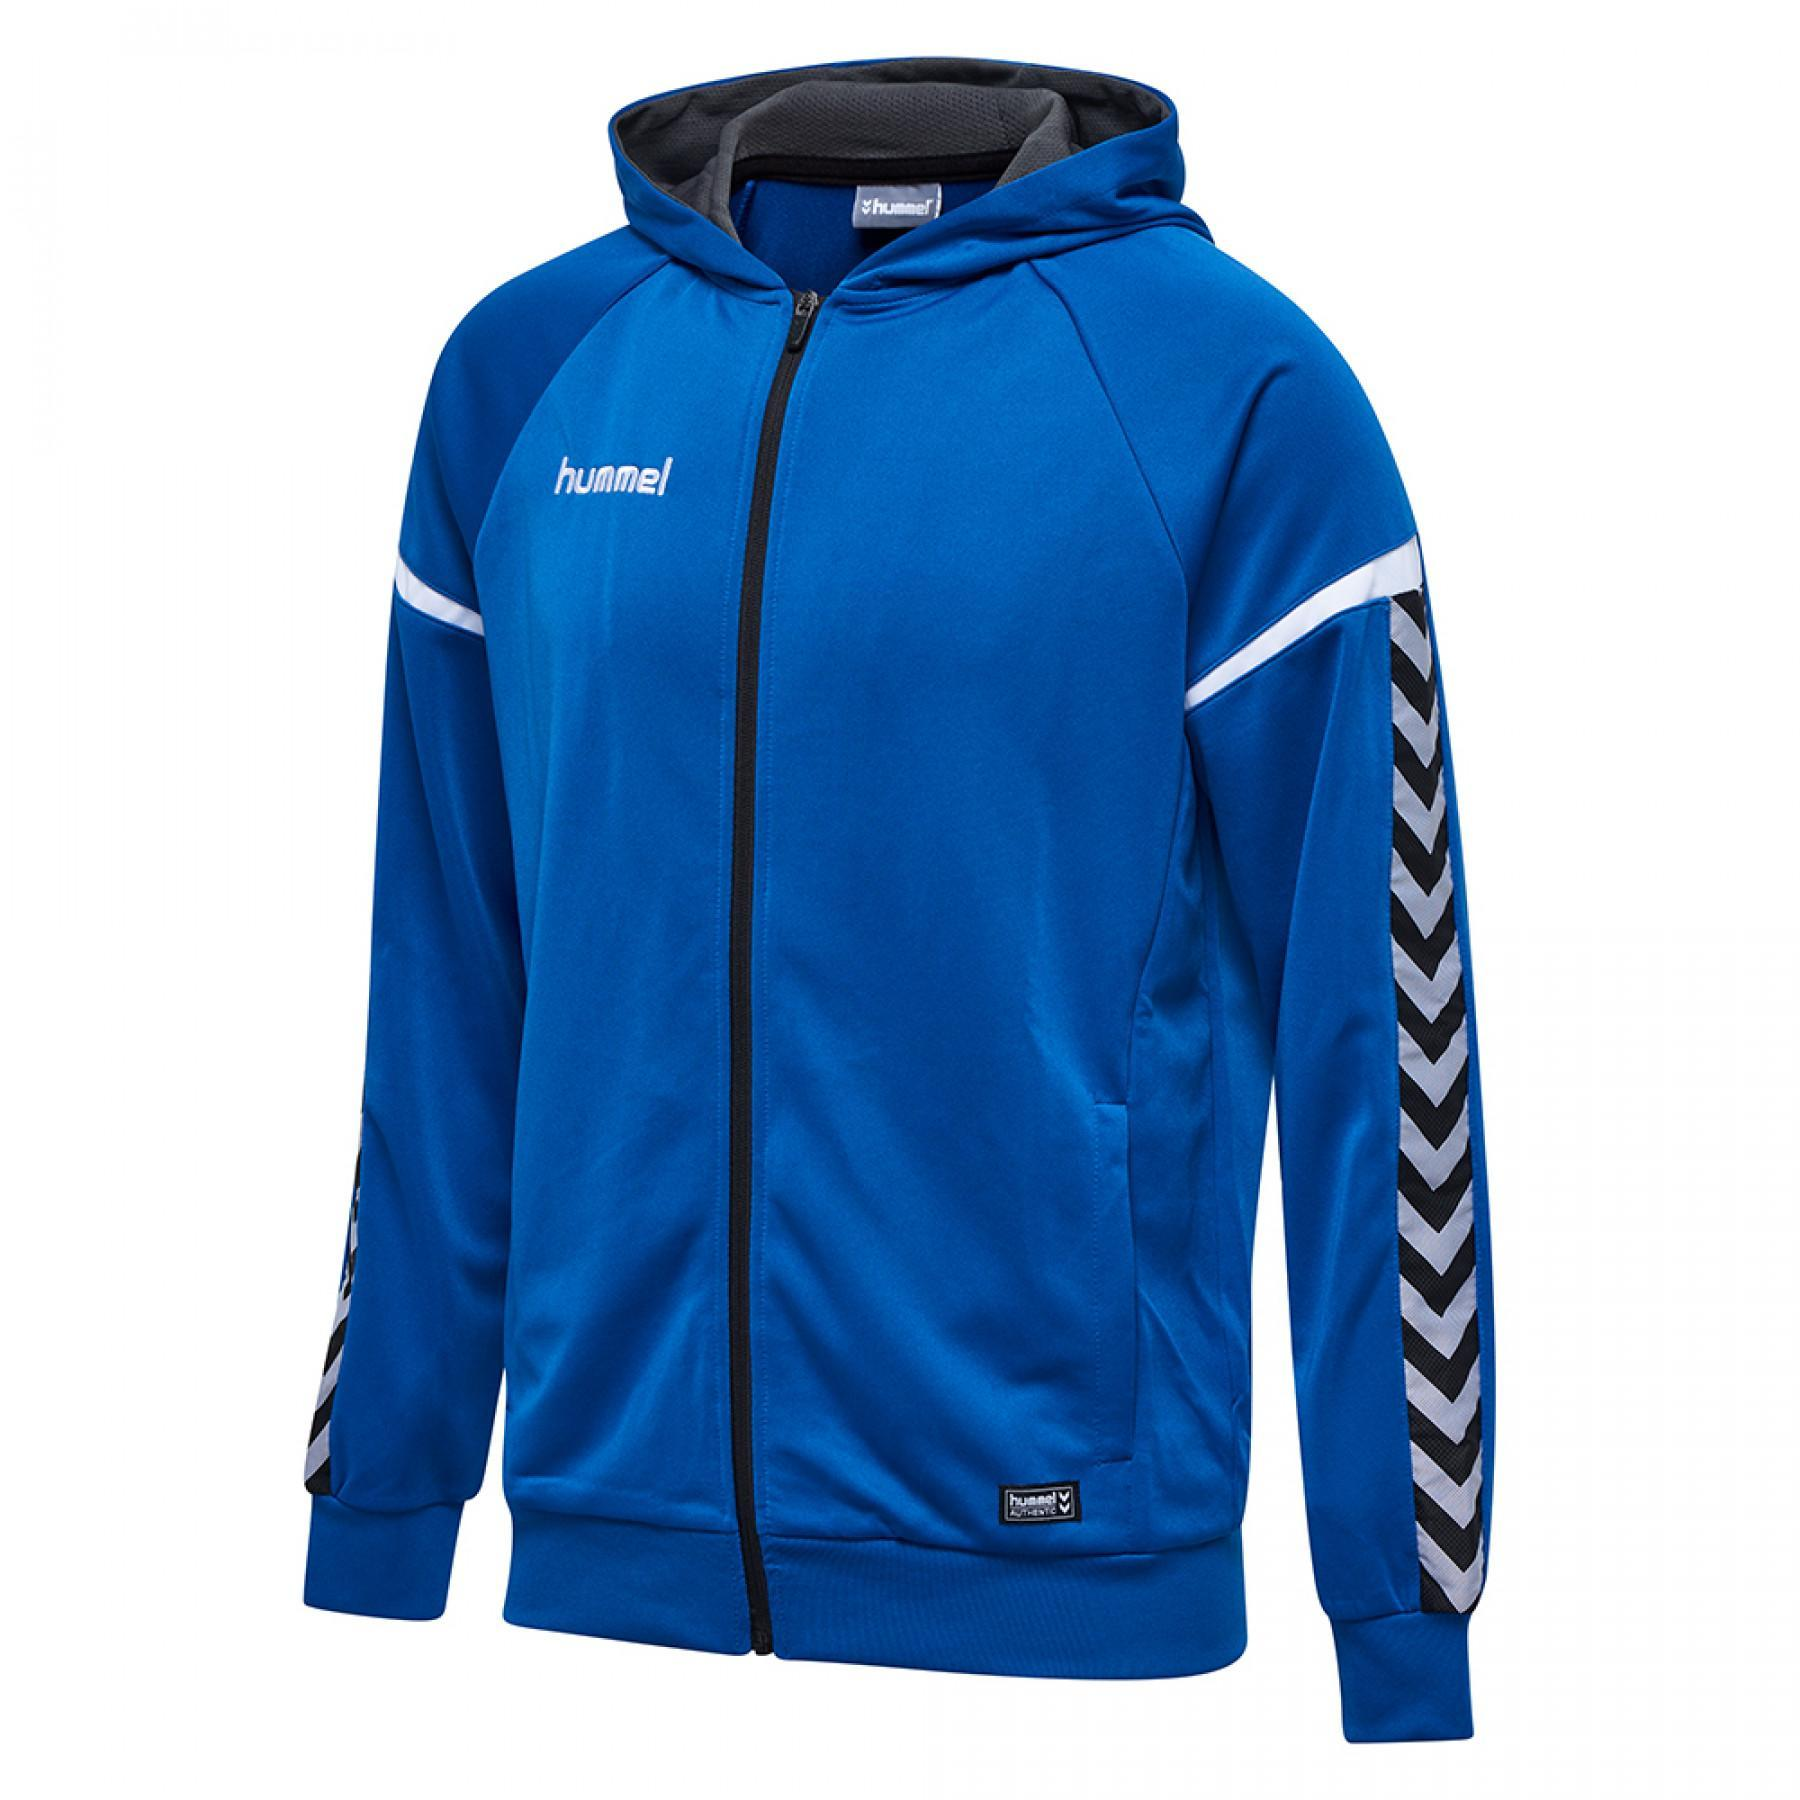 Hummel sweatshirt zip hoodie auth load